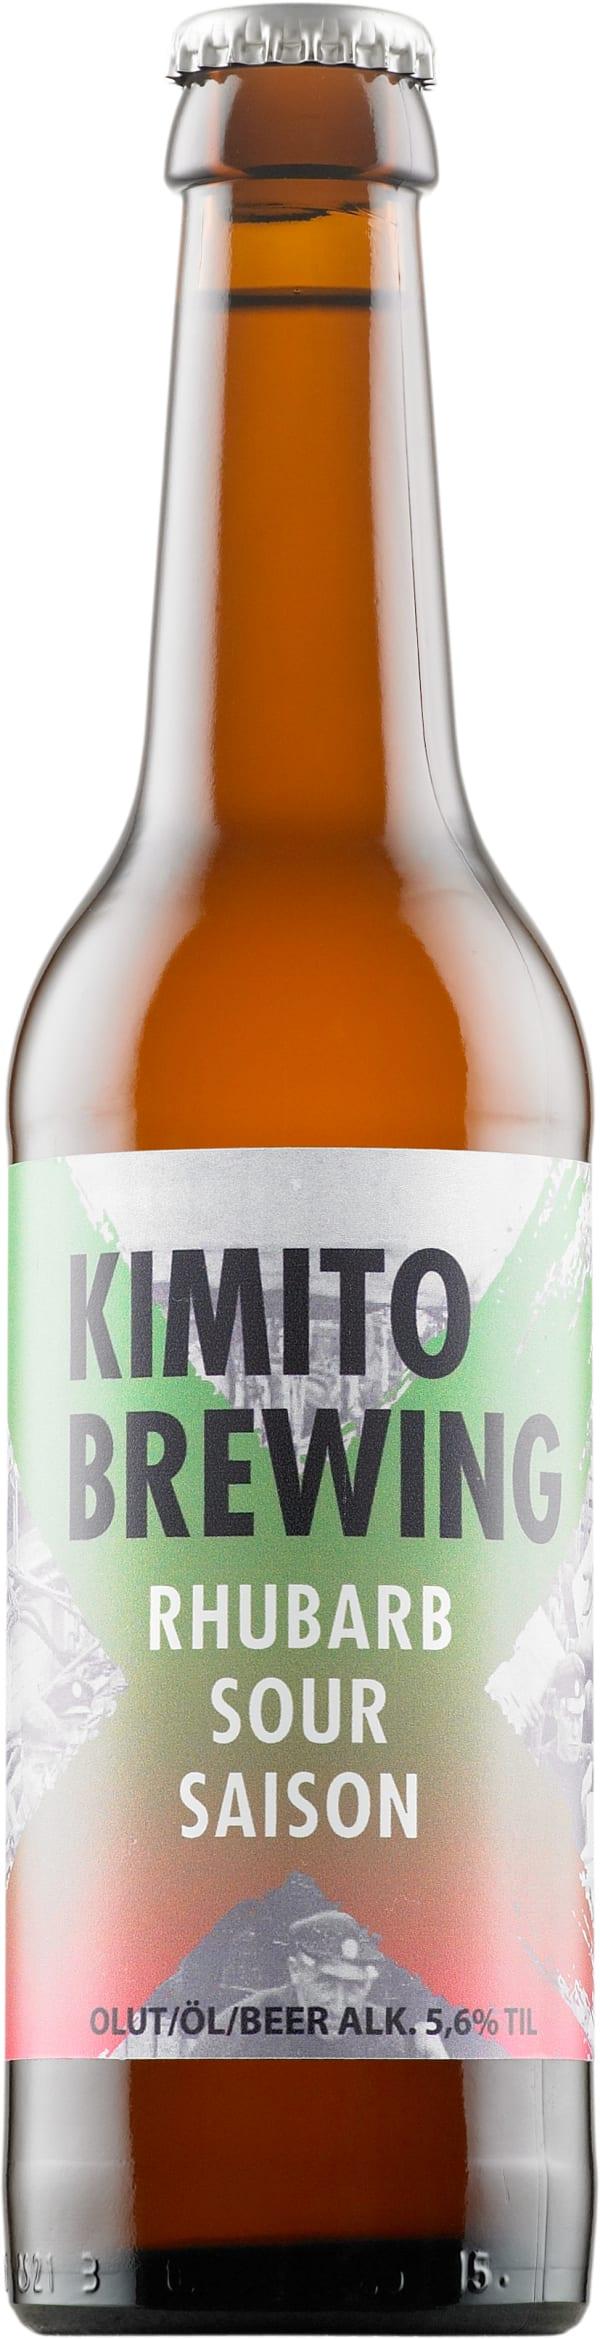 Kimito Rhubarb Sour Saison